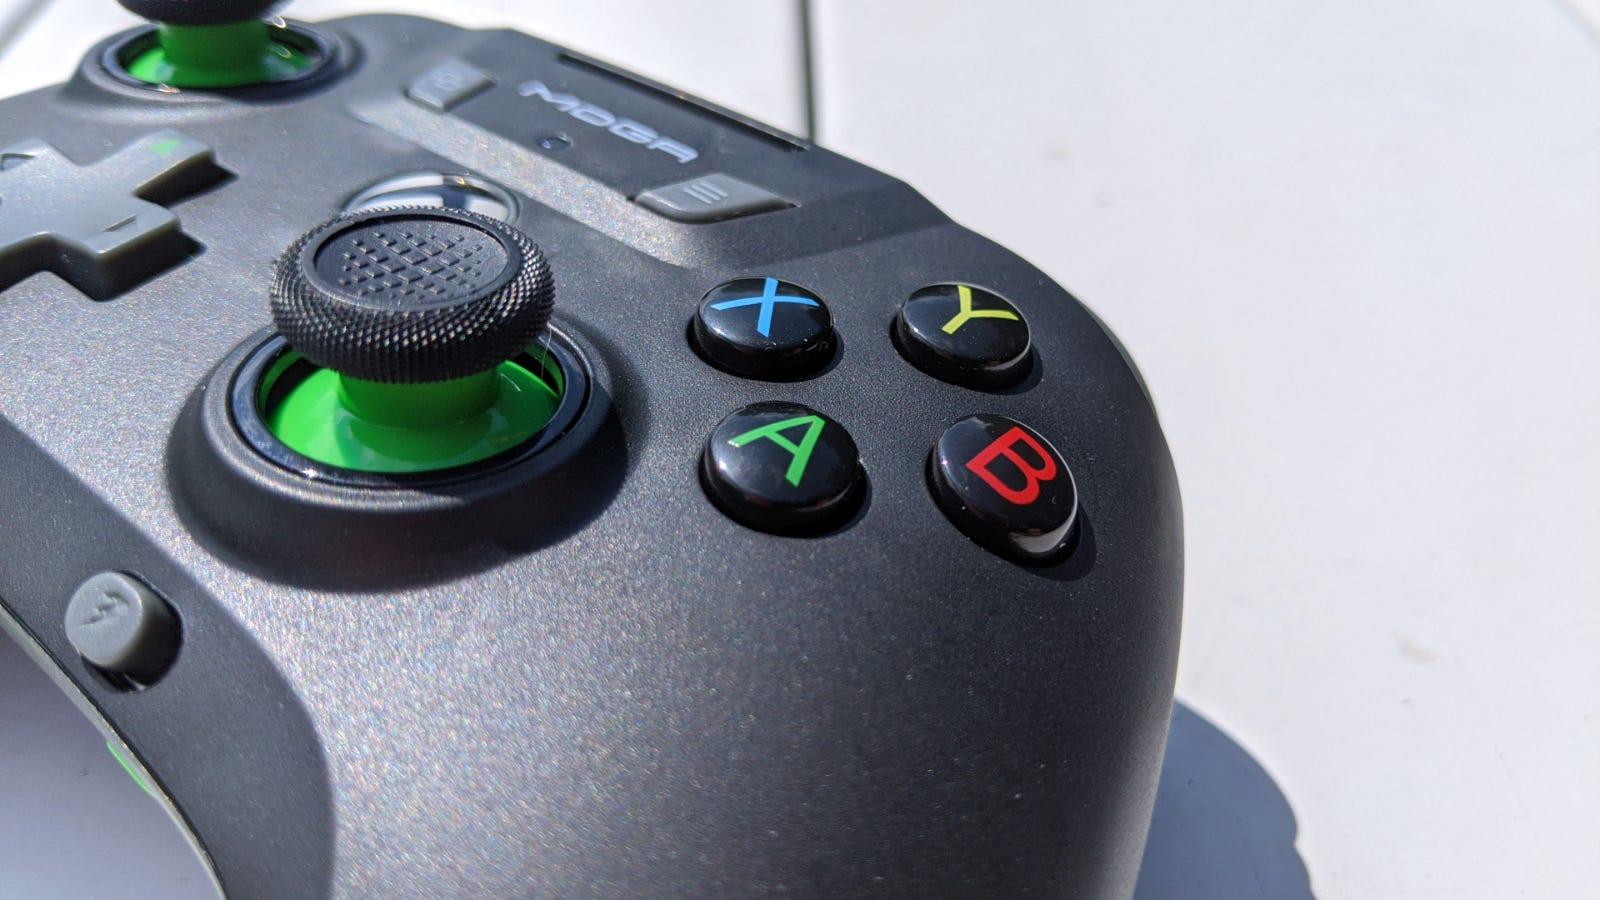 MOGA XP5-X Plus Sideview